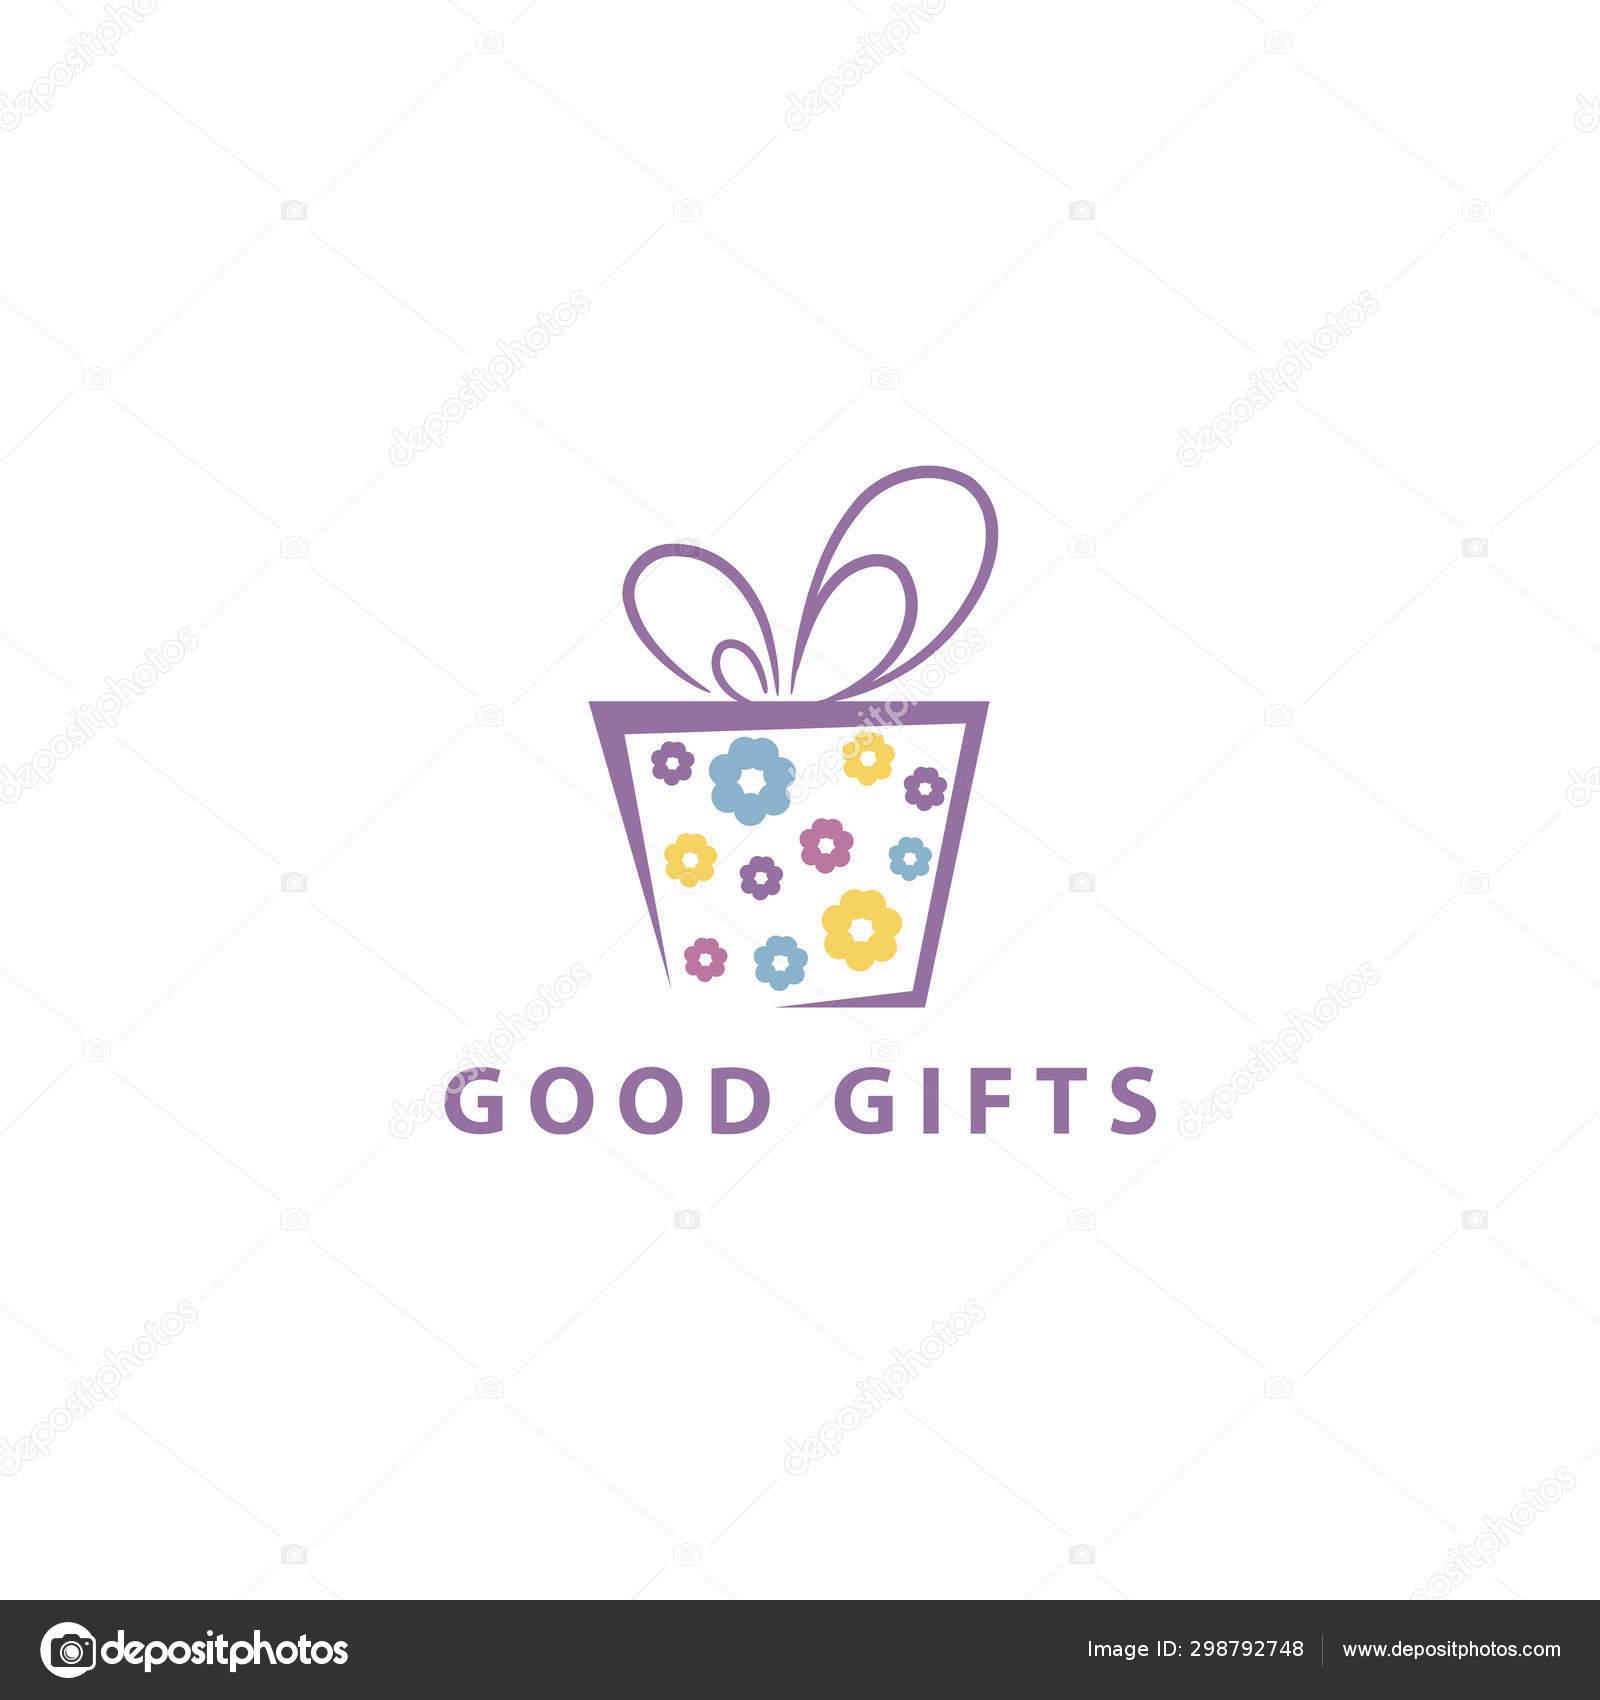 Gift Box Logo Design Blooming Surprise Packaging Box Vector Illustration Stock Vector C Ahsanalvi 298792748